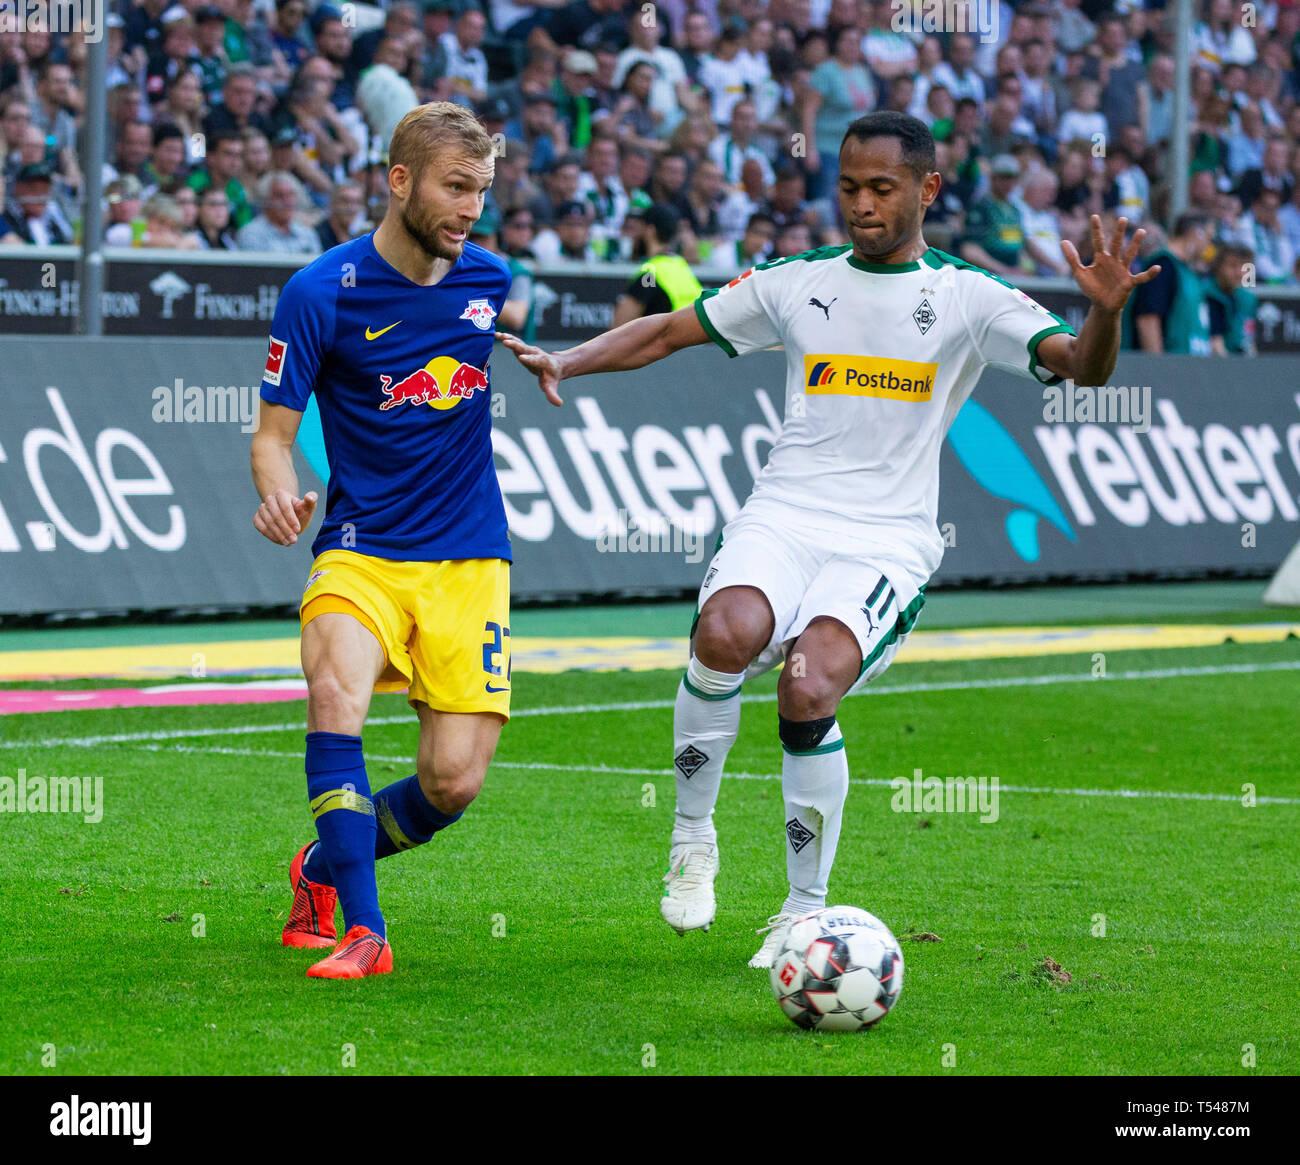 sports, football, Bundesliga, 2018/2019, Borussia Moenchengladbach vs RB Leipzig 1-2, Stadium Borussia Park, scene of the match, Konrad Laimer (RBL) left and Raffael (MG), DFL REGULATIONS PROHIBIT ANY USE OF PHOTOGRAPHS AS IMAGE SEQUENCES AND/OR QUASI-VIDEO - Stock Image